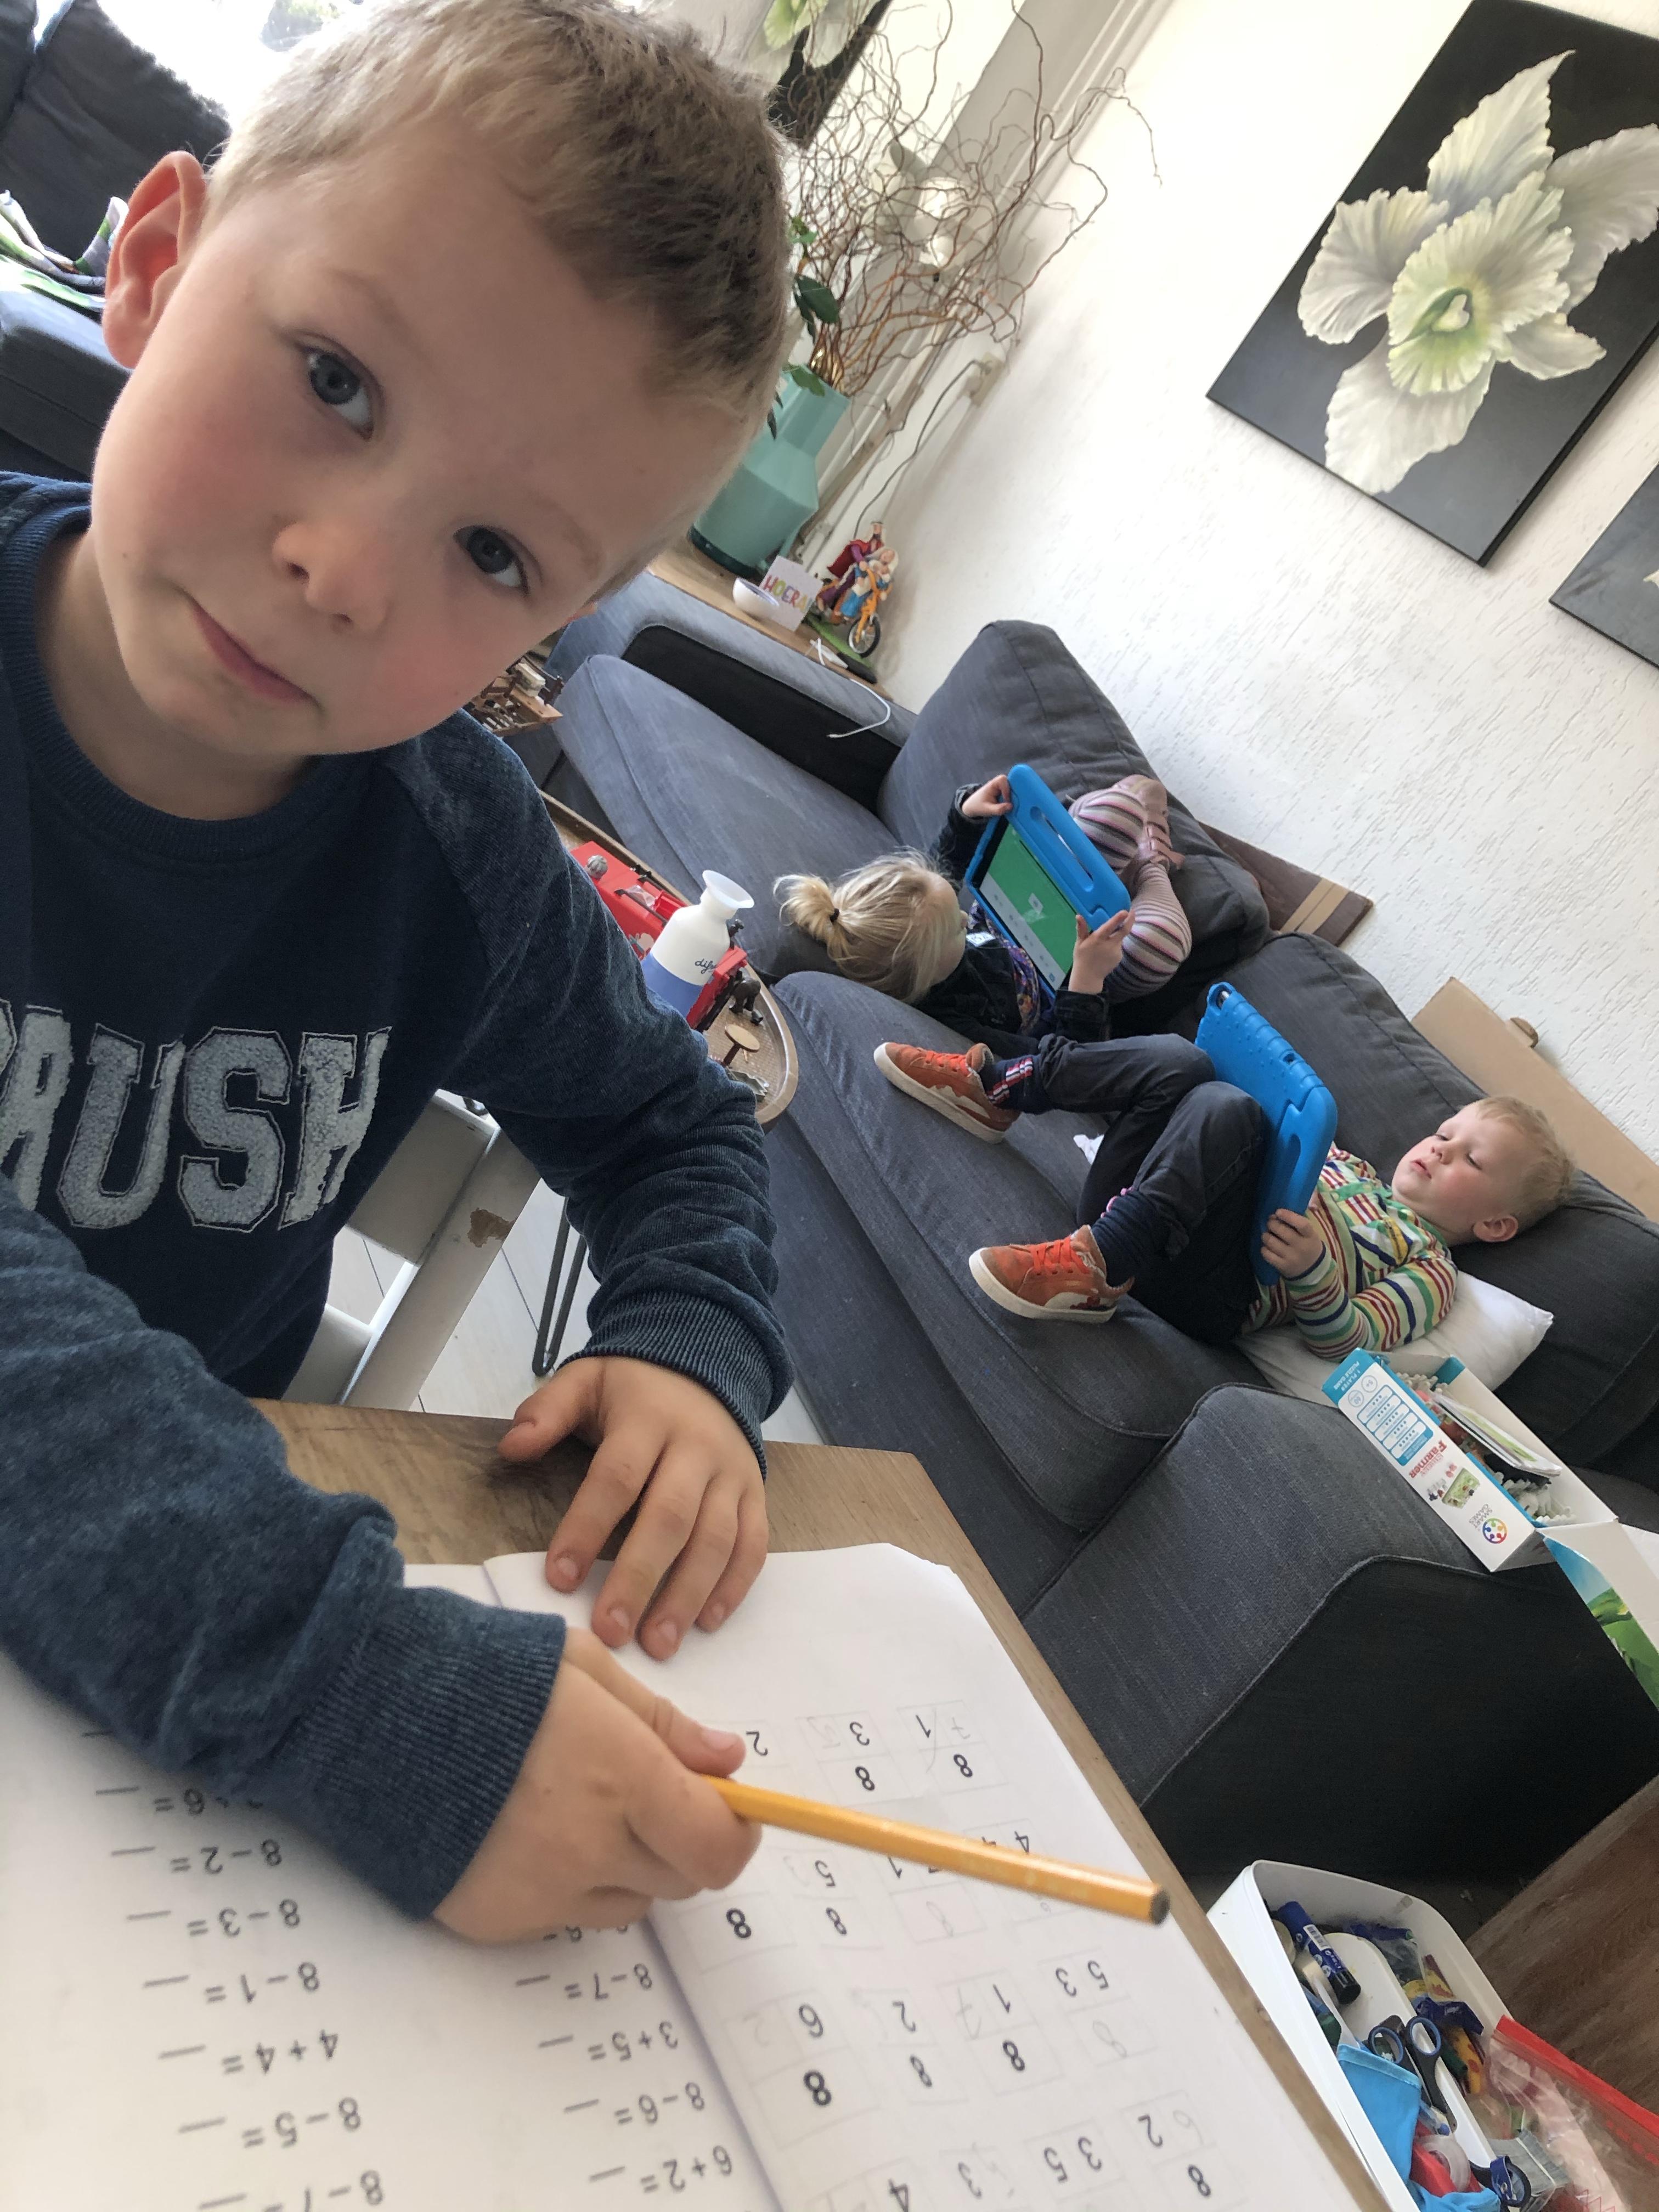 leerplicht, mama, thuisschool, moeder, multitasken, coronavirus, homescholing